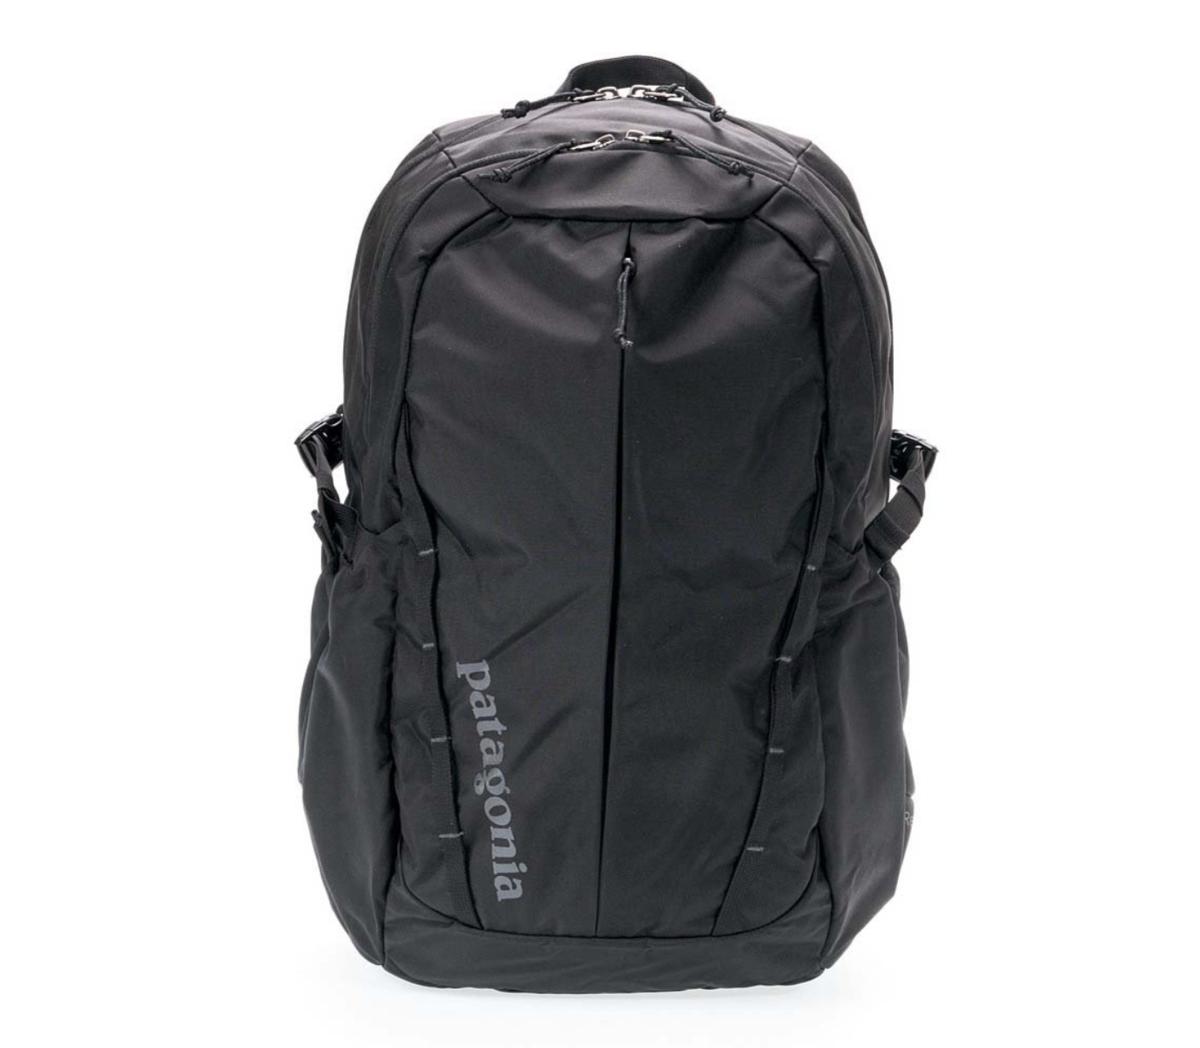 f:id:thebackpack:20190329212143p:plain